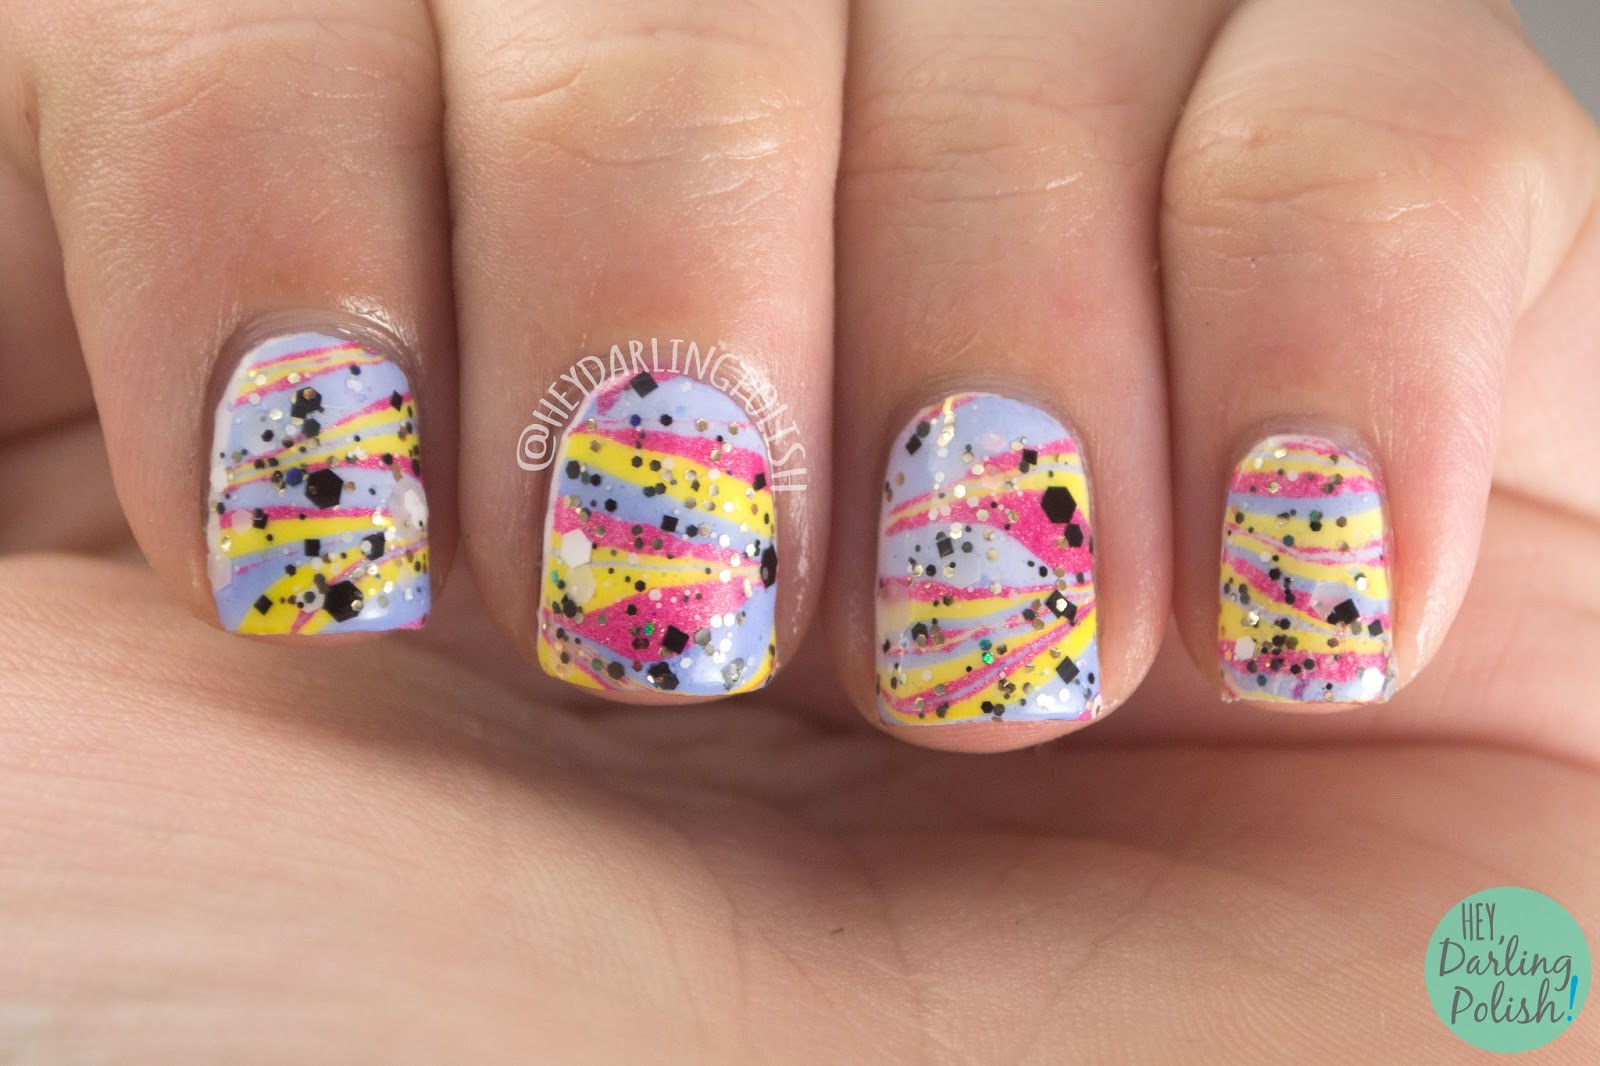 nails, nail art, nail polish, watermarble, primary colors, red, blue, yellow, glitter, hey darling polish, tri polish challenge, indie polish